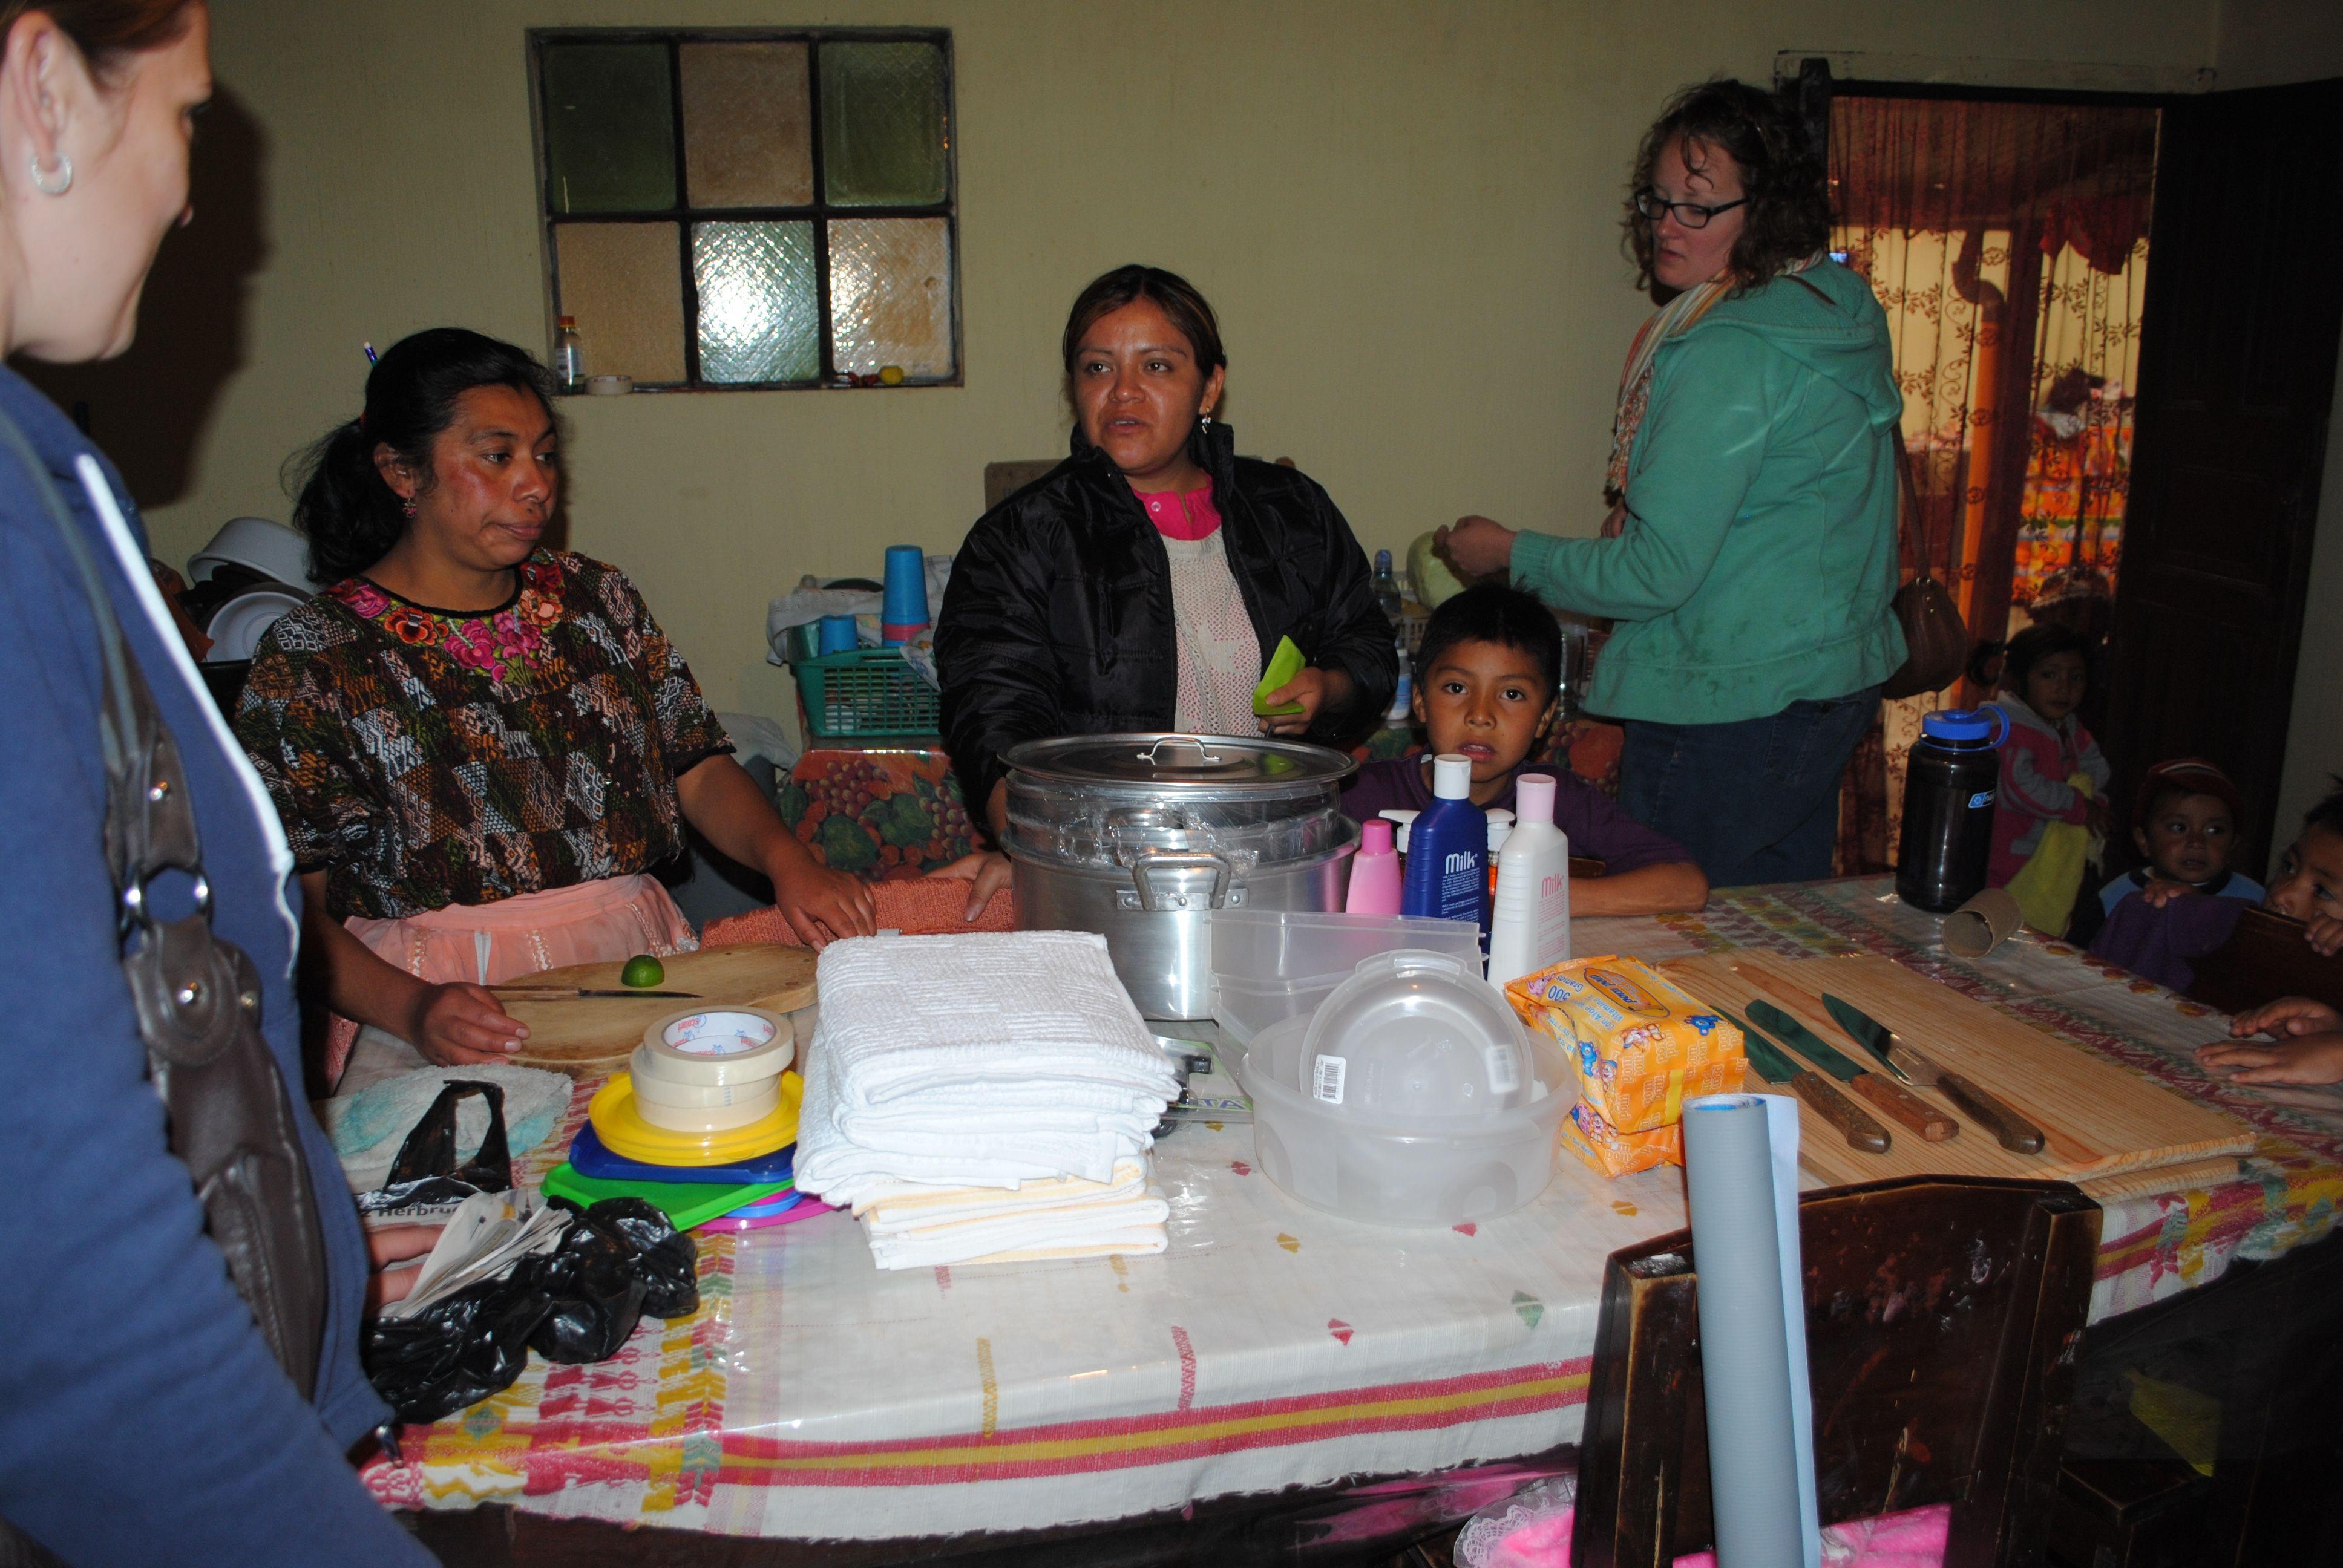 Abroaderview Donations For The Children Center Guatemala Quetzaltenango  March 2014 . Basic Kitchen Supplies, Pots